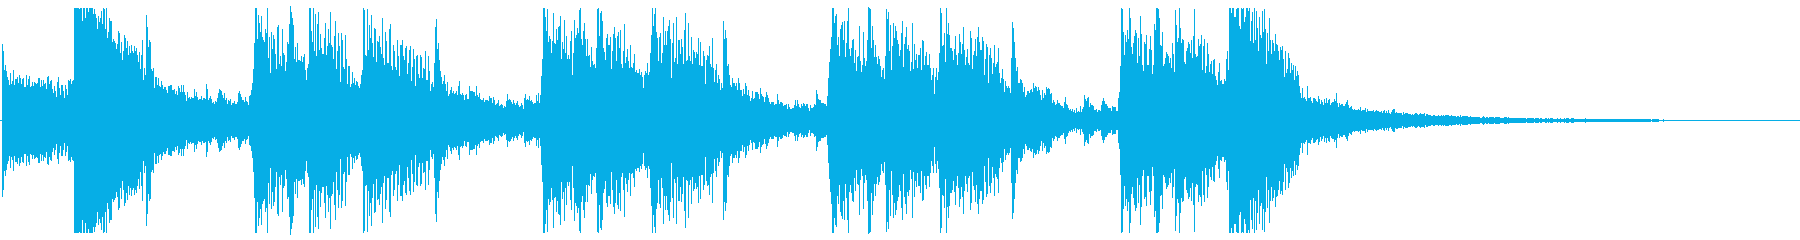 CM企業VP・生アコギ♪ジングルPOPの再生済みの波形